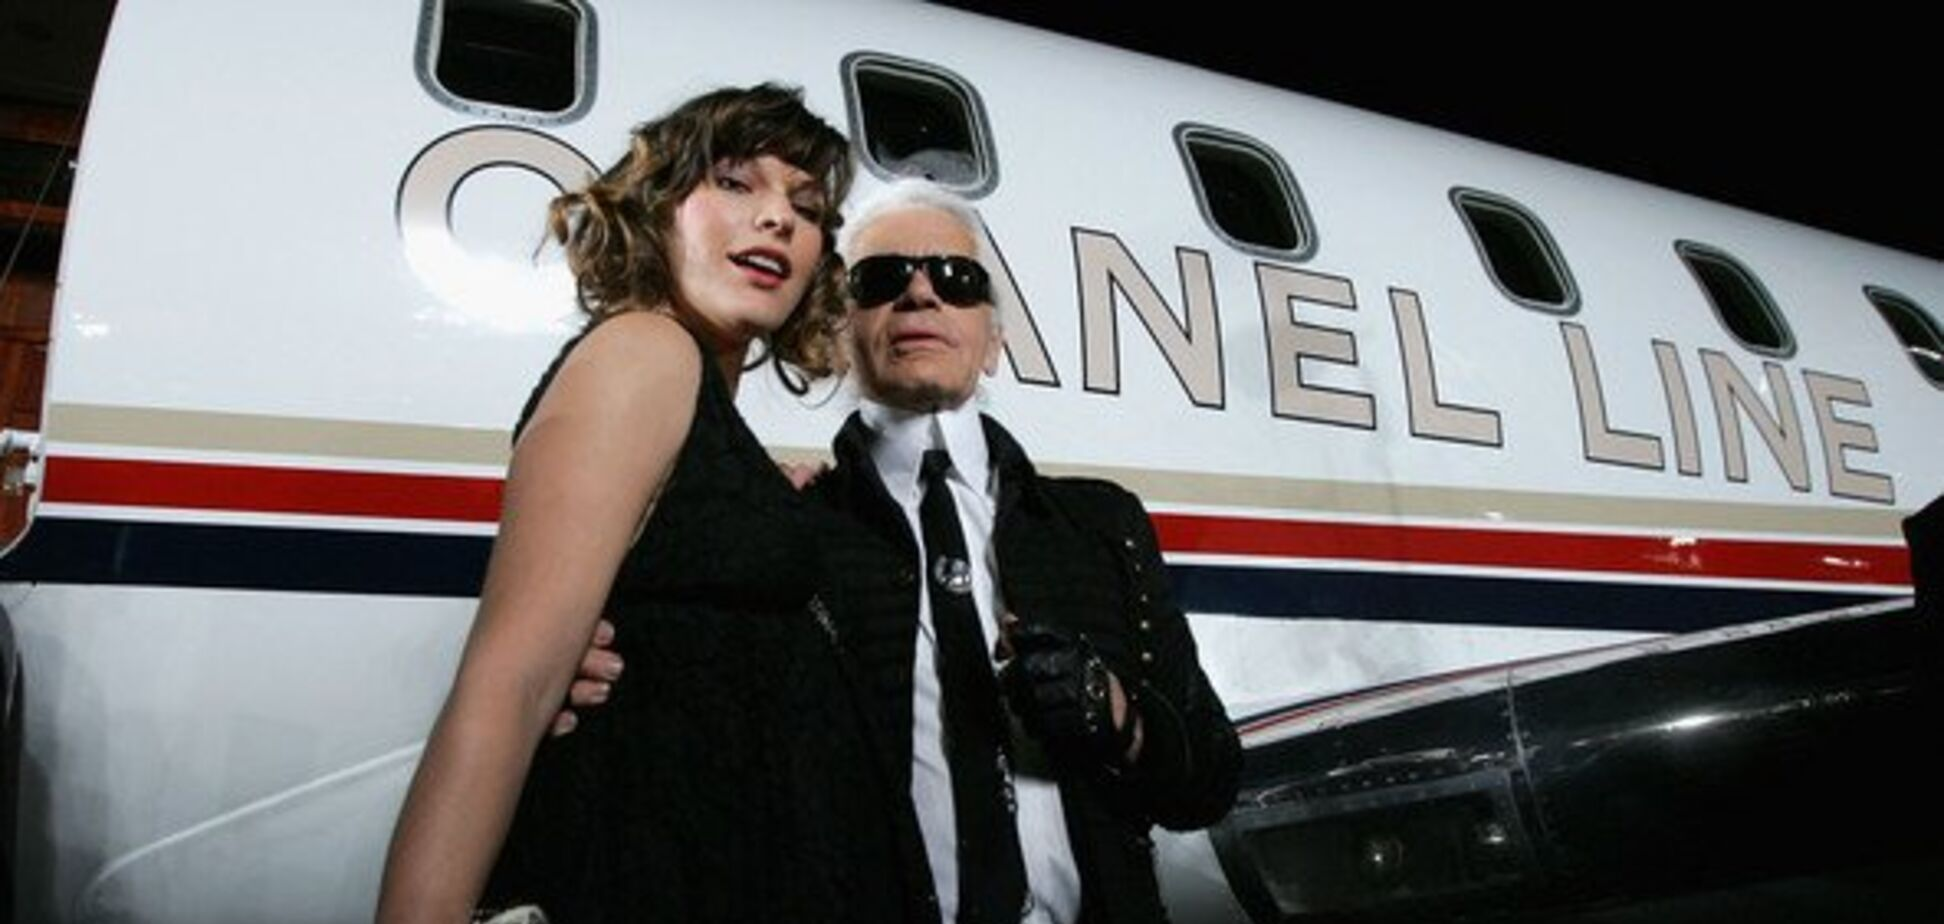 Карл Лагерфельд: хто з українок був у житті легендарного модельєра Chanel